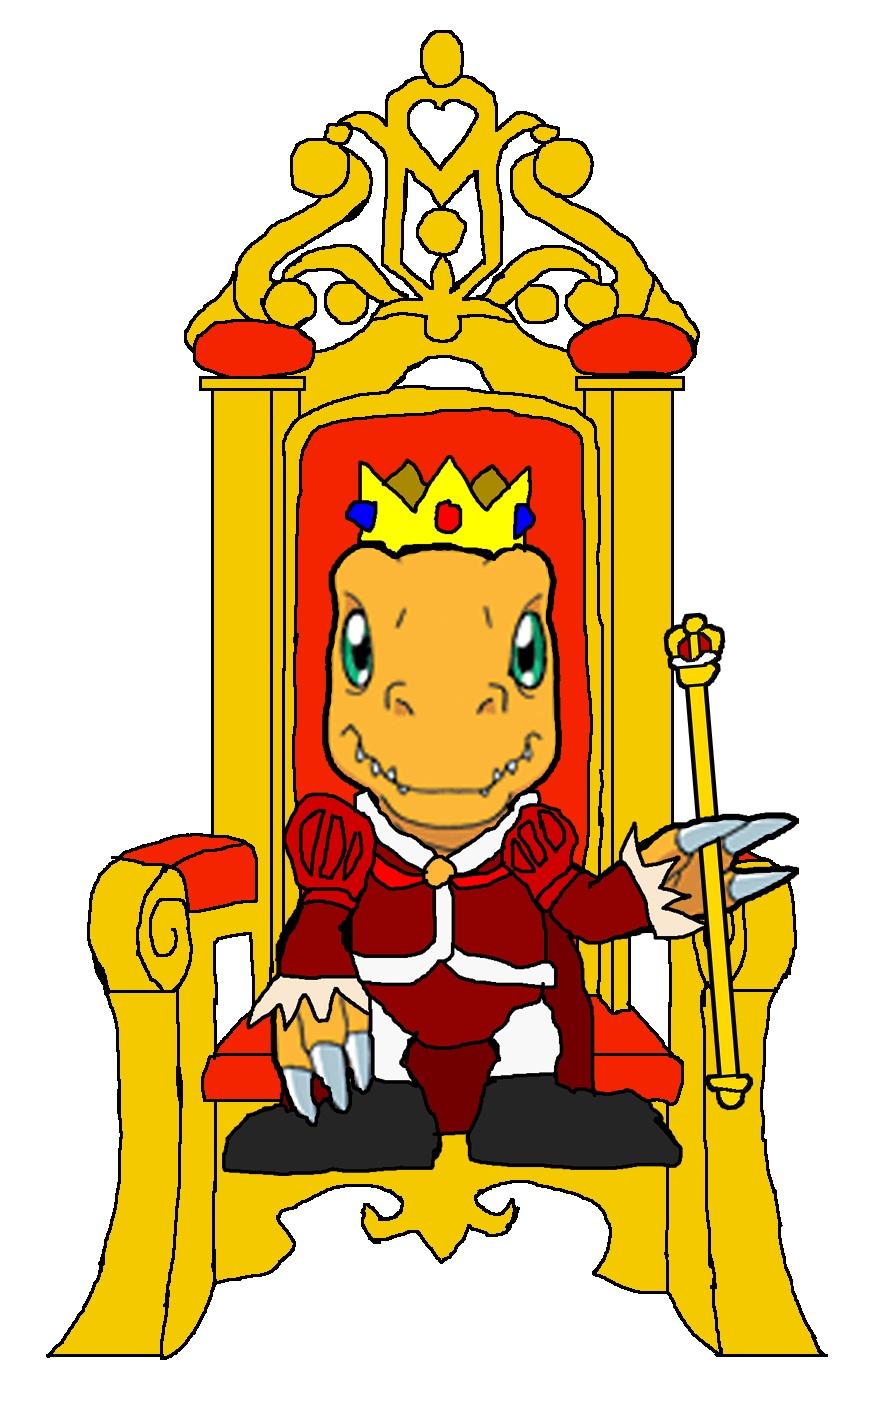 Throne clipart cartoon By Agumon KingLeonLionheart Throne King